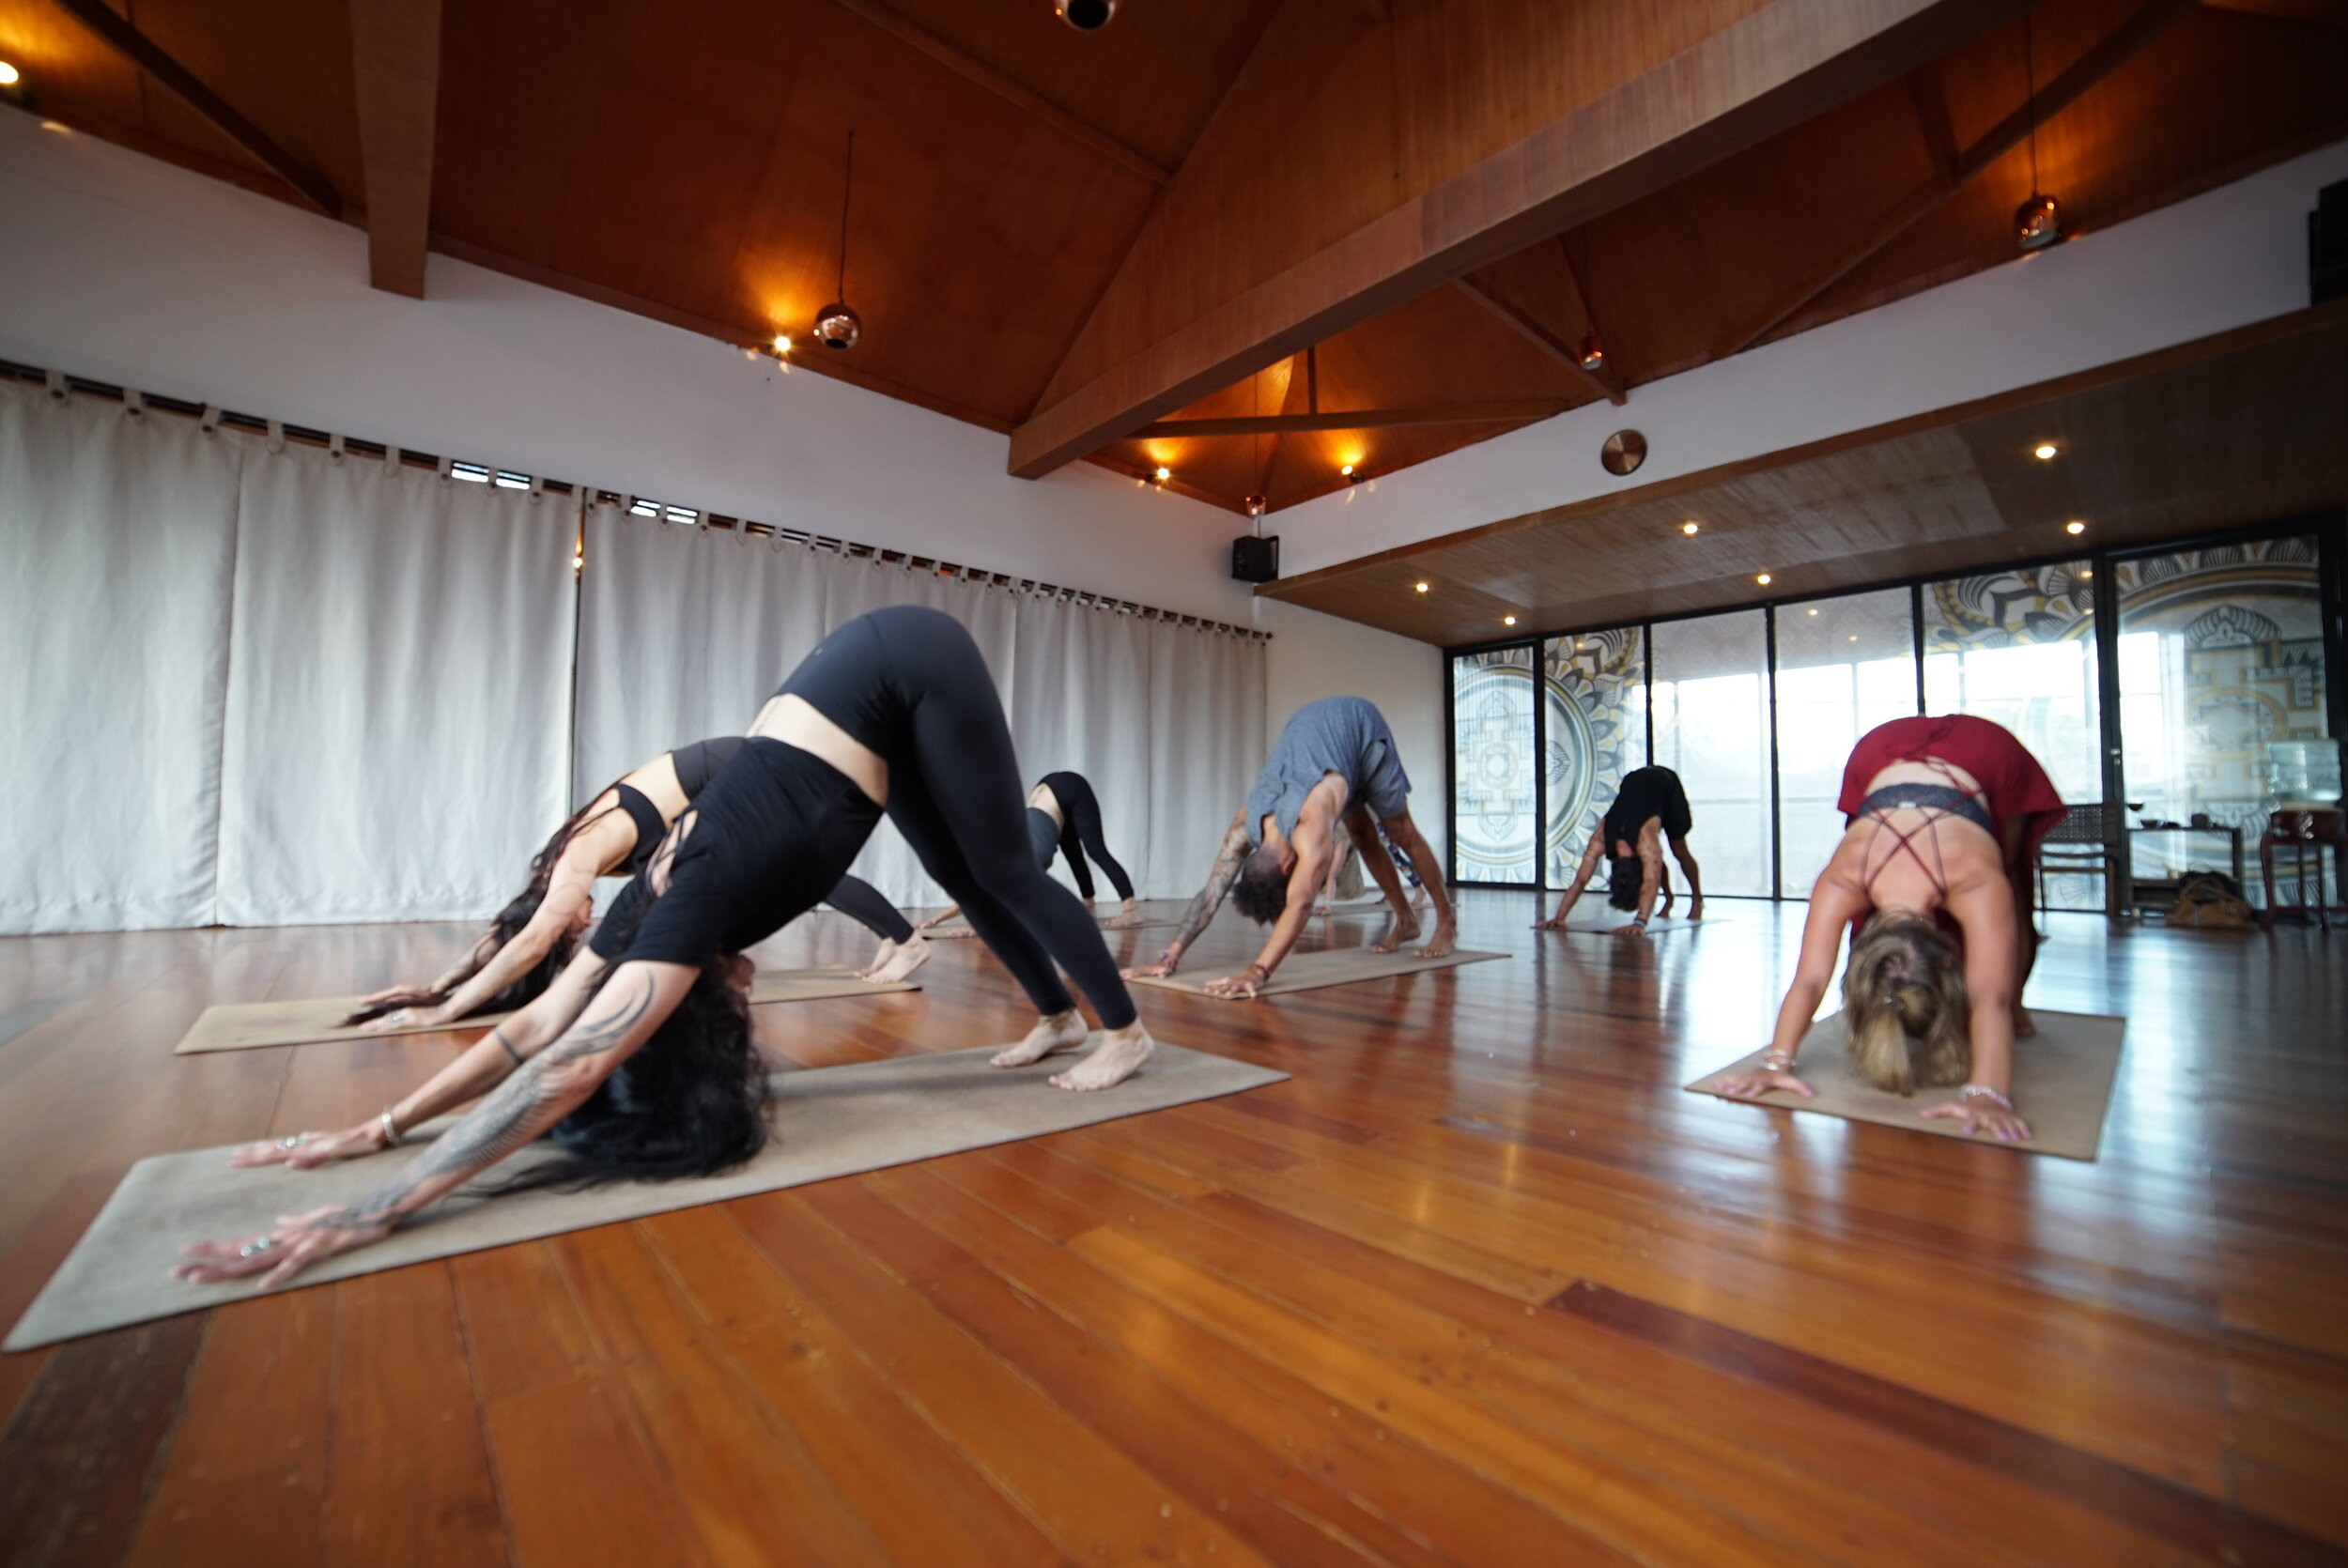 2019_05_04_Karma_House_Yoga_A7sii_89.JPG